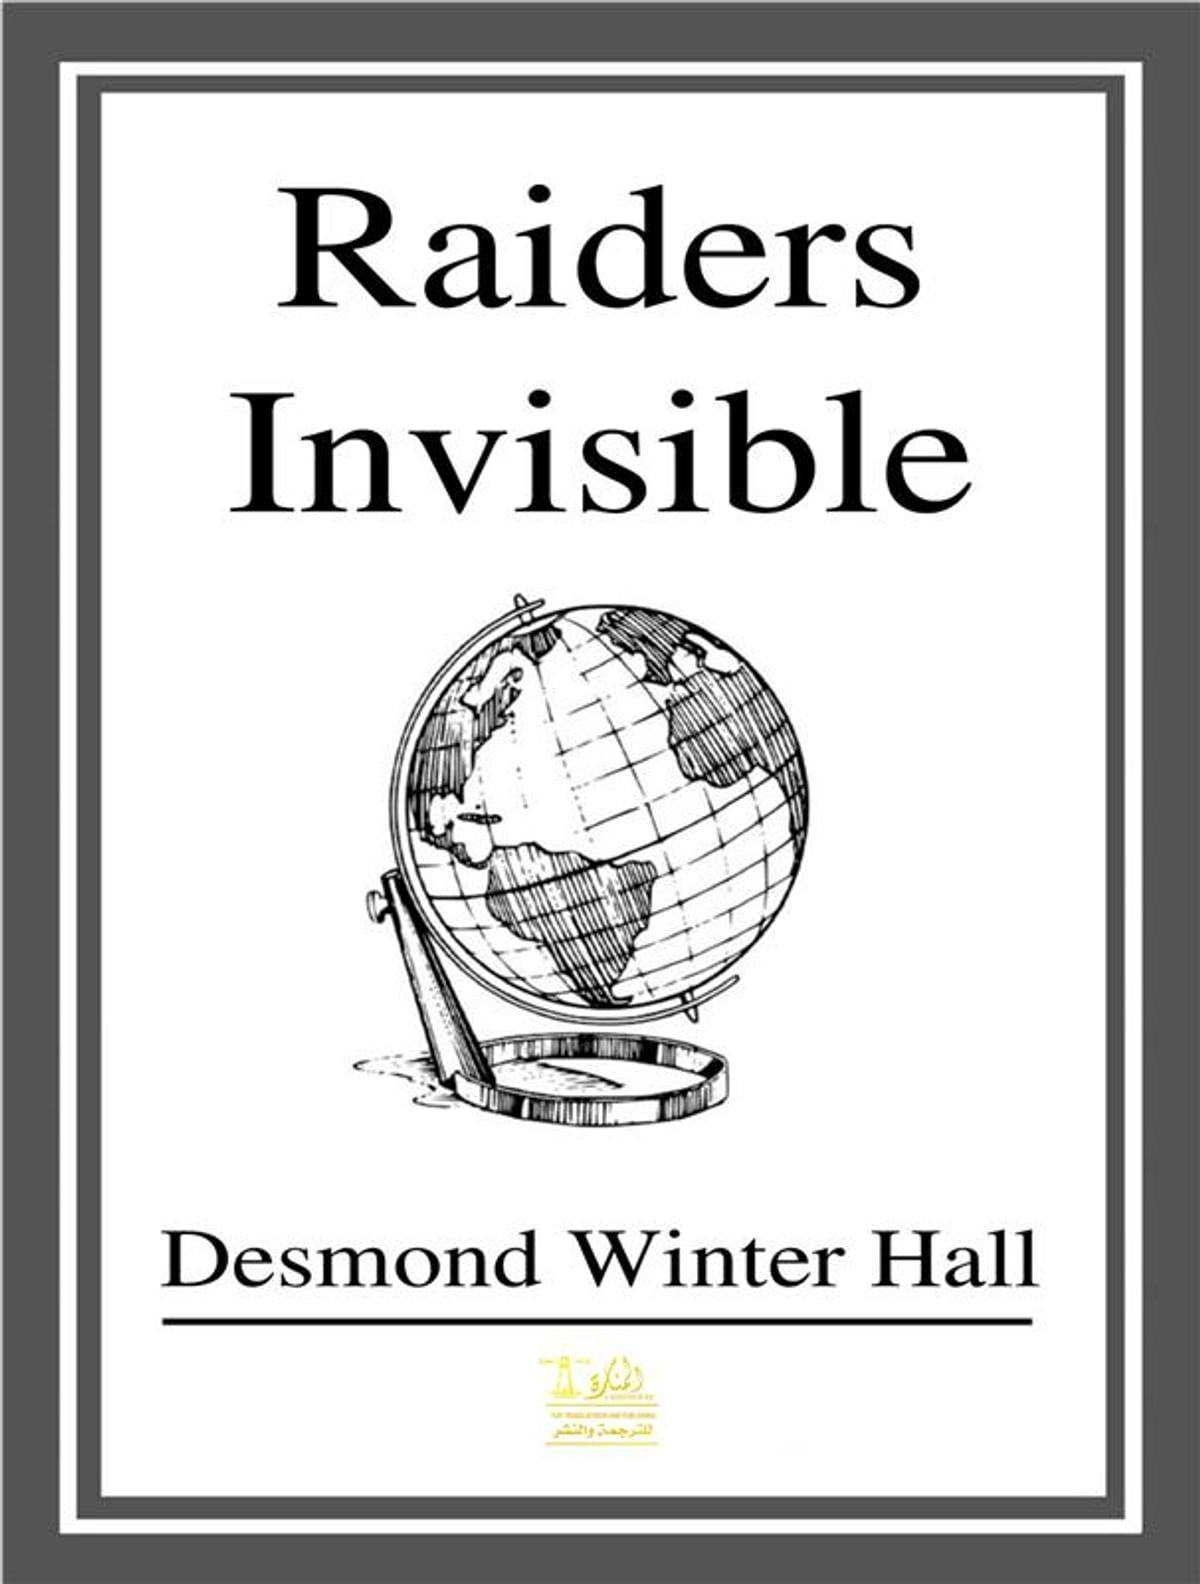 Raiders Invisible eBook by Desmond Winter Hall